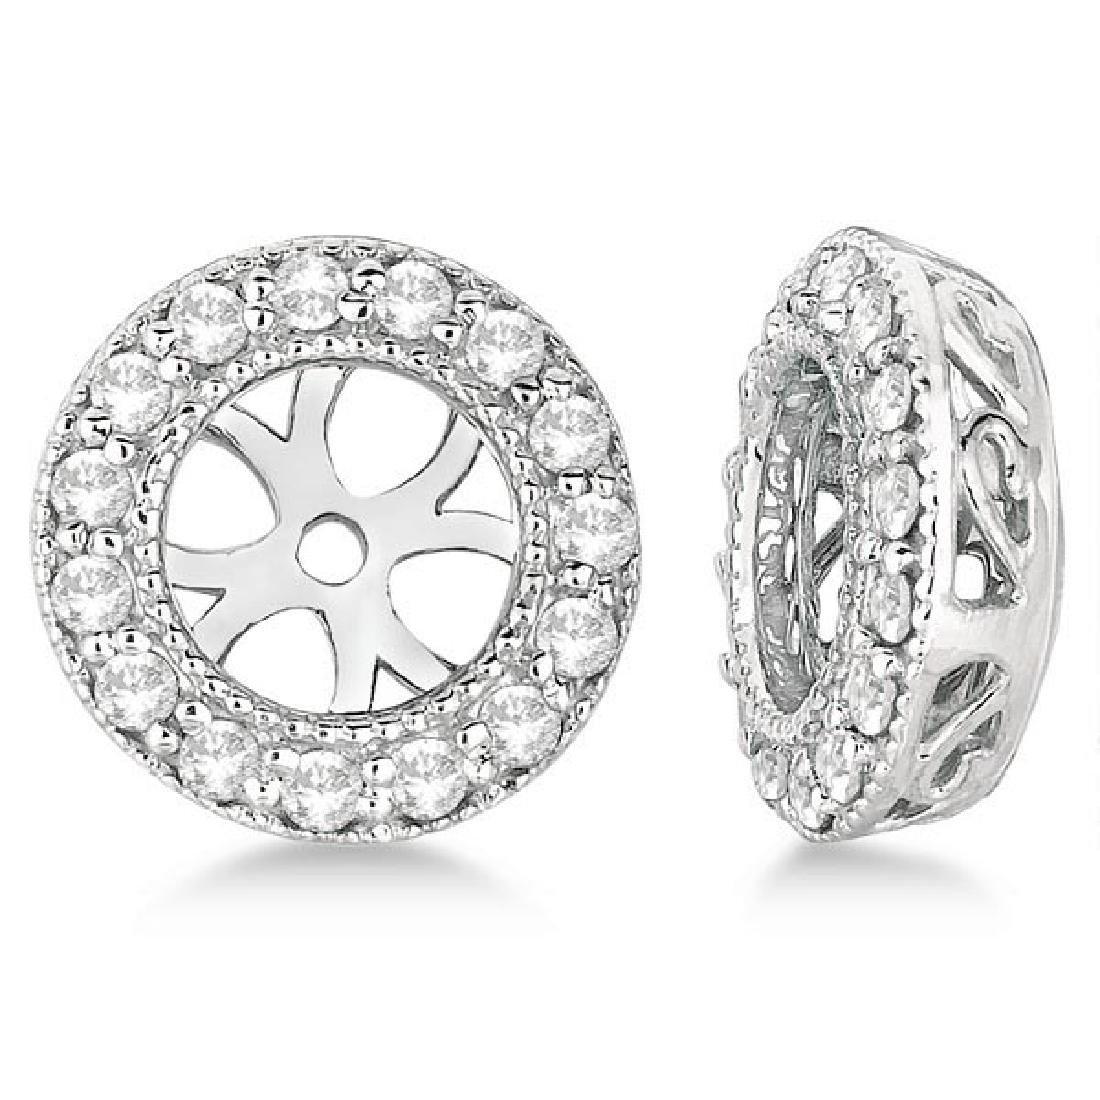 Vintage Round Cut Diamond Earring Jackets 14k White Gol